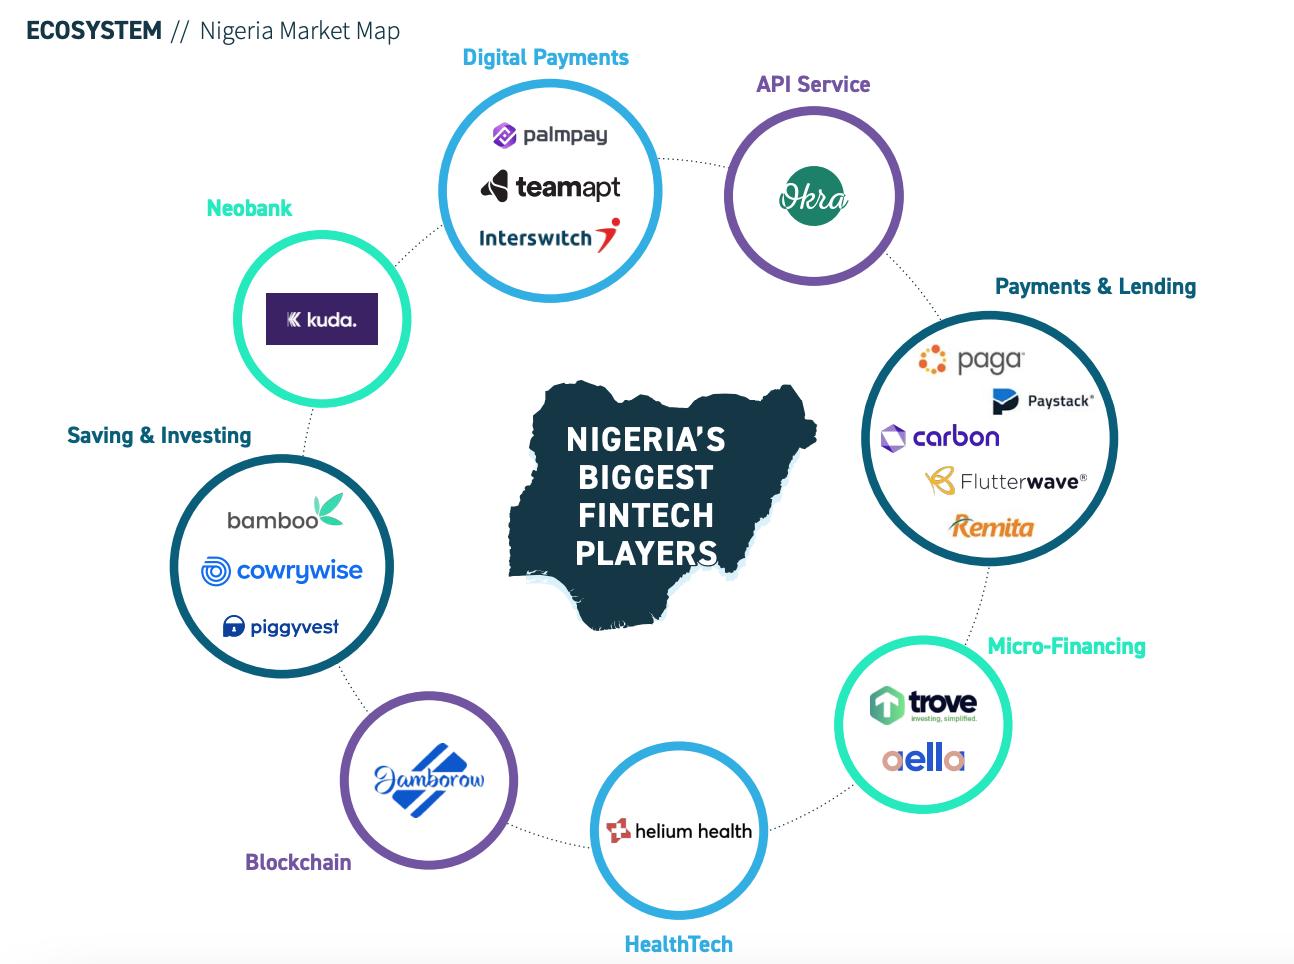 Nigeria's biggest fintech players, Africa Fintech State of the Industry 2020, Africa Fintech Summit, Oct 2020